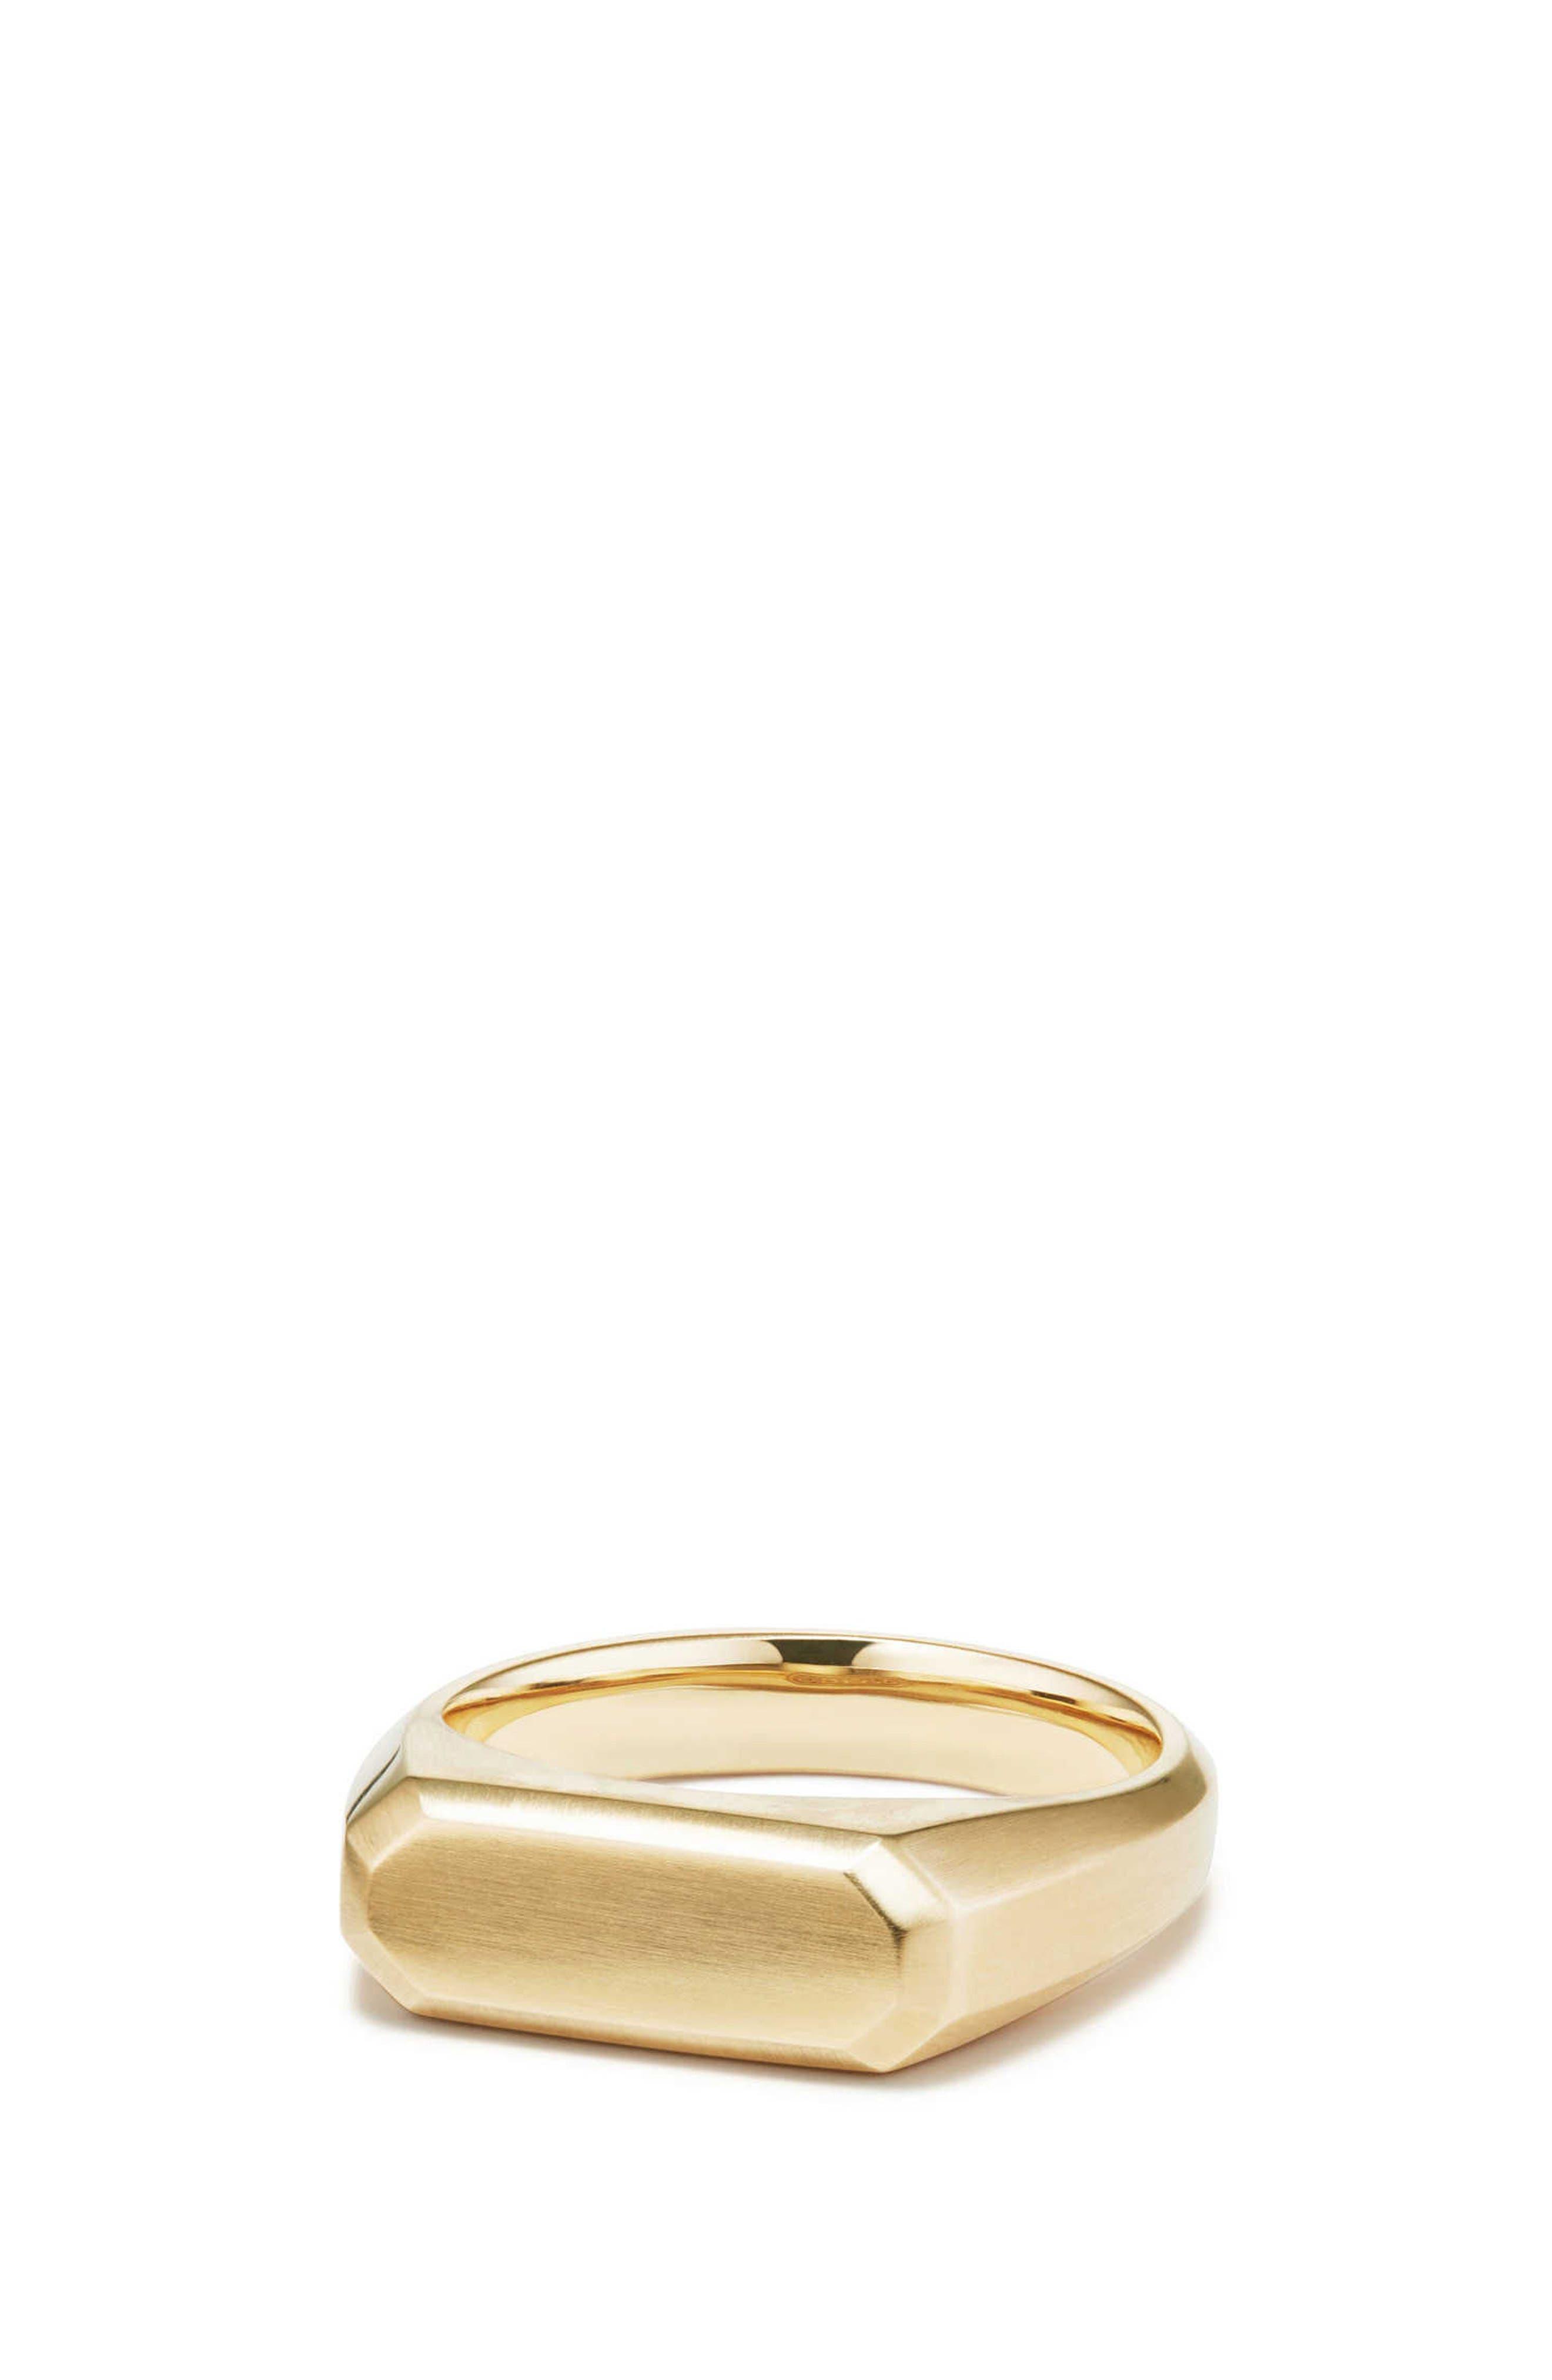 Main Image - David Yurman Streamline Signet Ring in 18K Gold